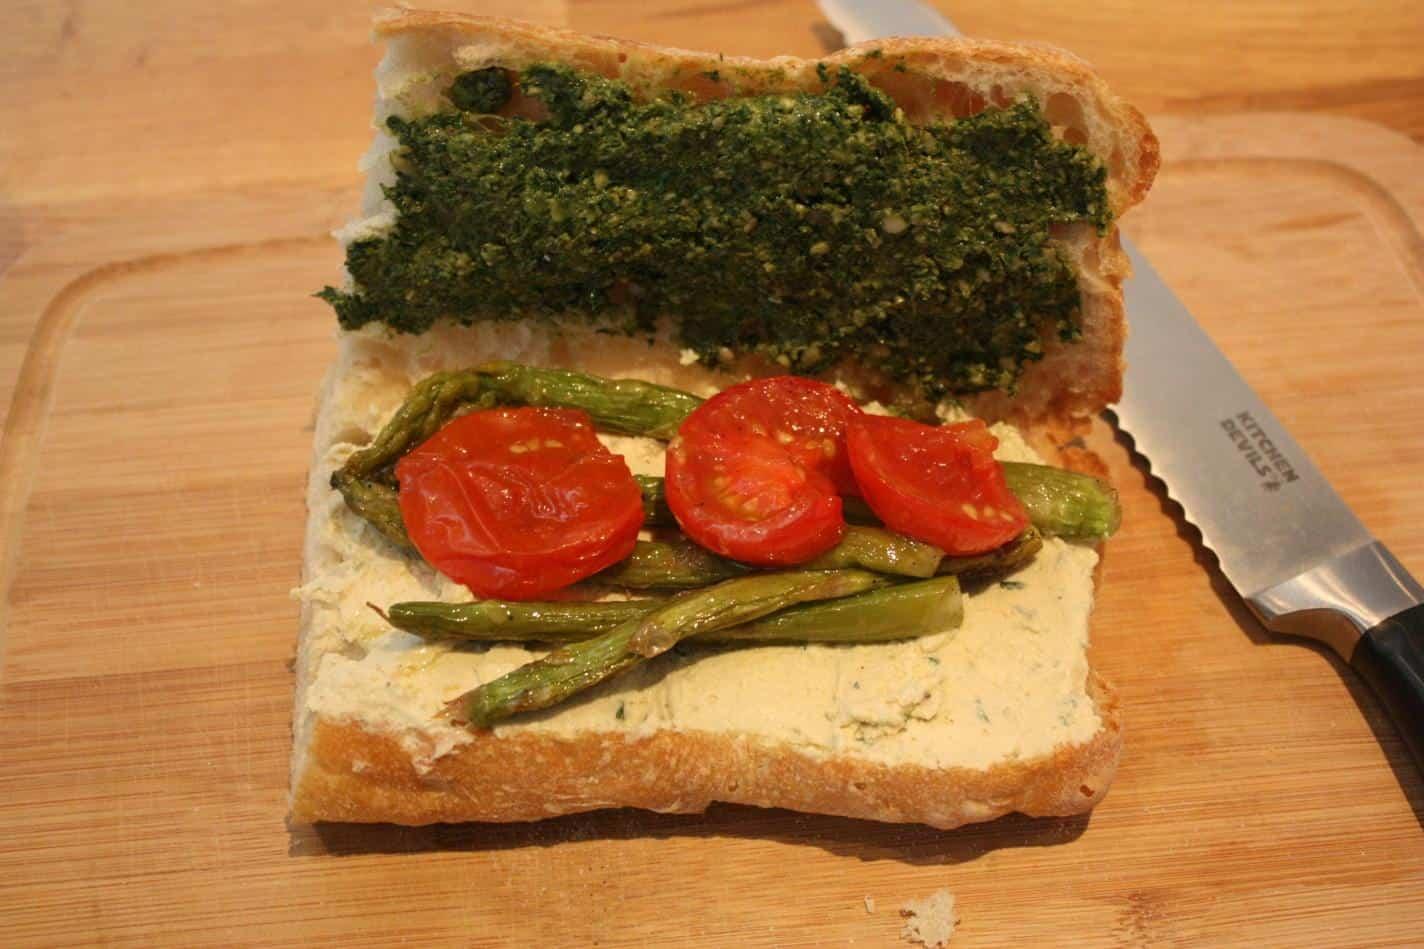 Vegan pesto, cashew cheese, roasted asparagus and tomato sandwich